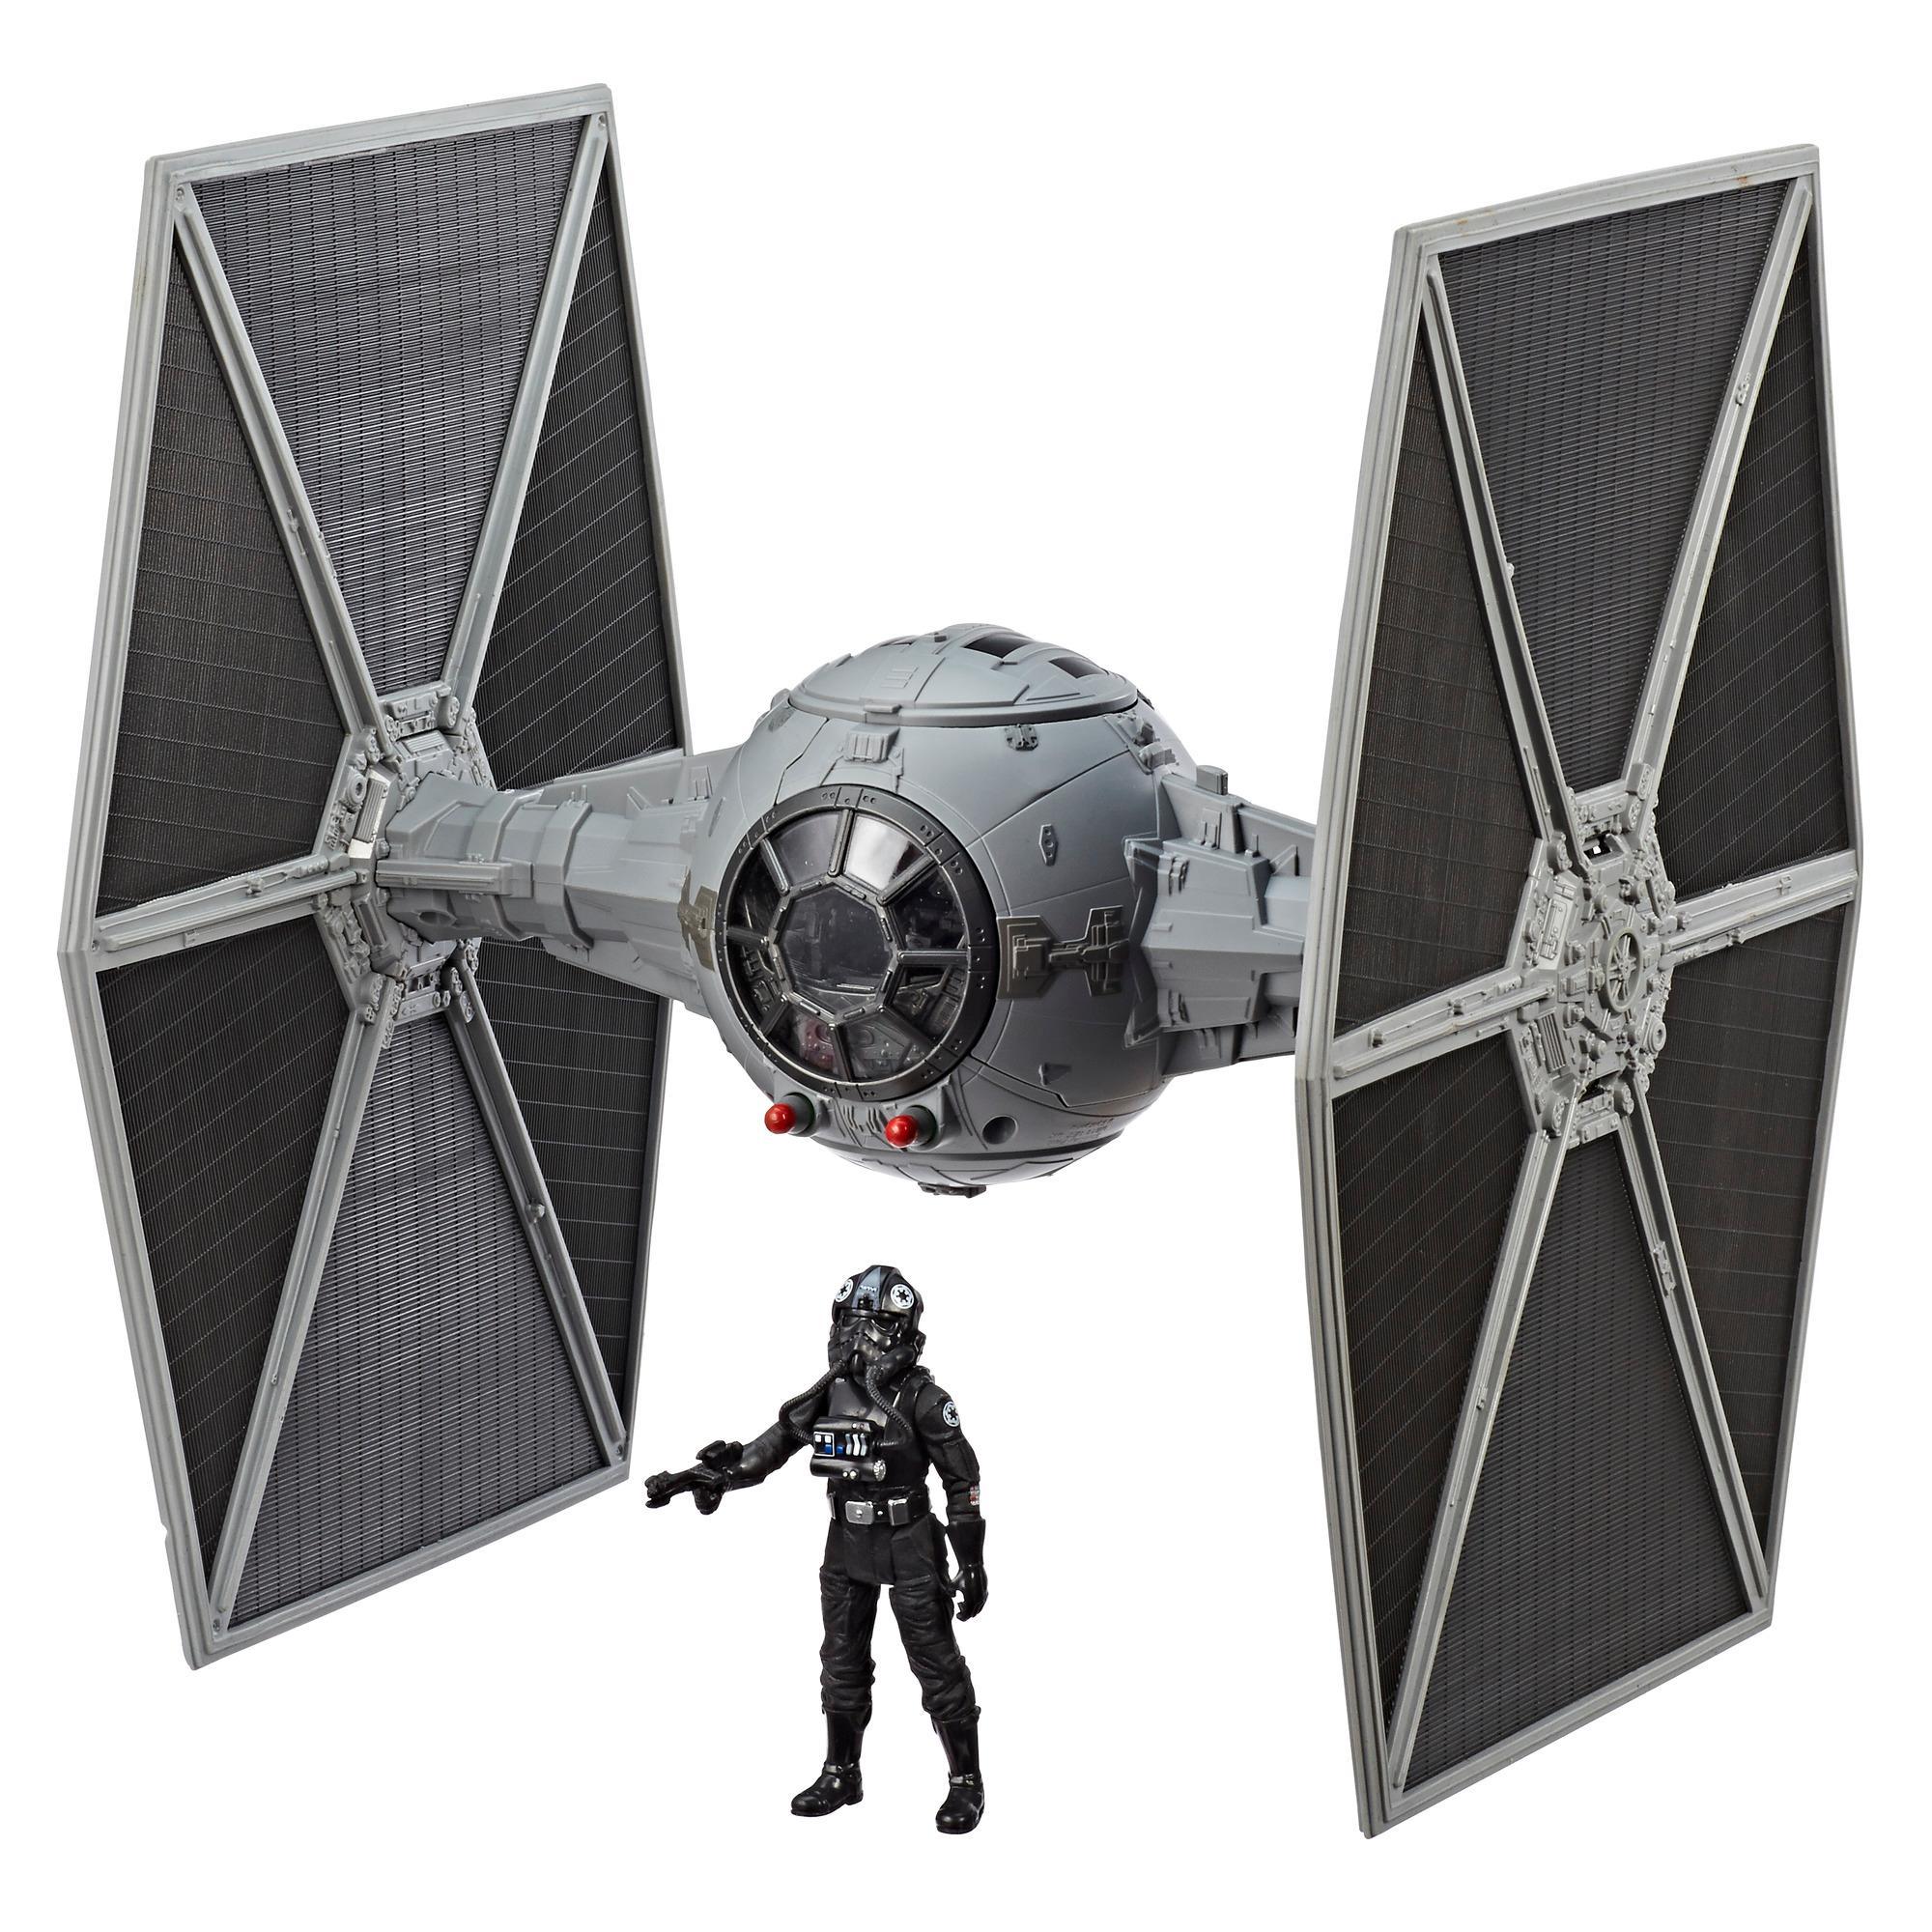 Star Wars Force Link 2.0 - Chasseur TIE et figurine pilote de chasseur TIE